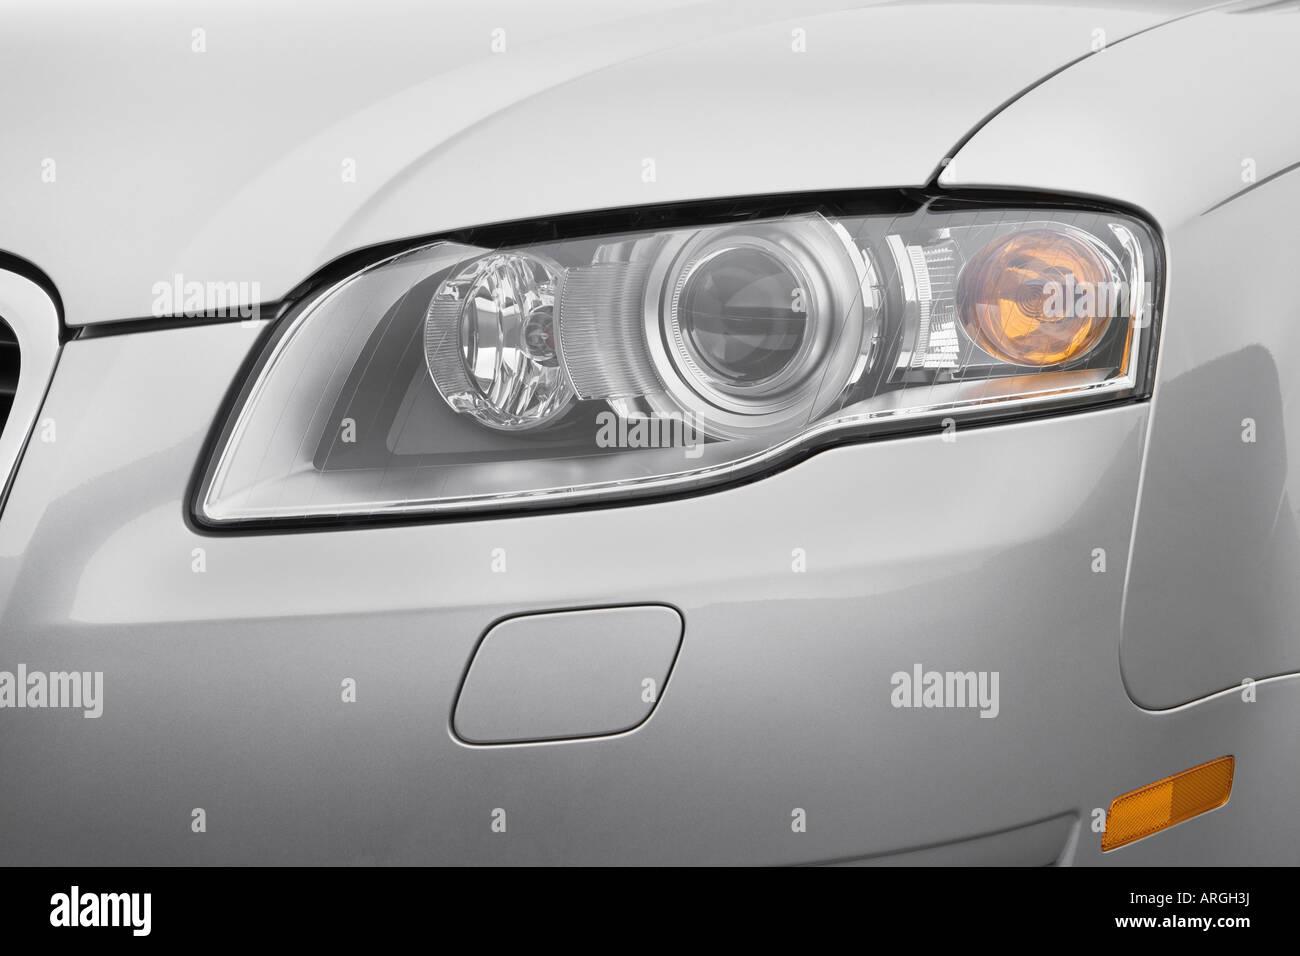 Audi A Avant Quattro In Silver Headlight Stock Photo - 2007 audi a4 headlights